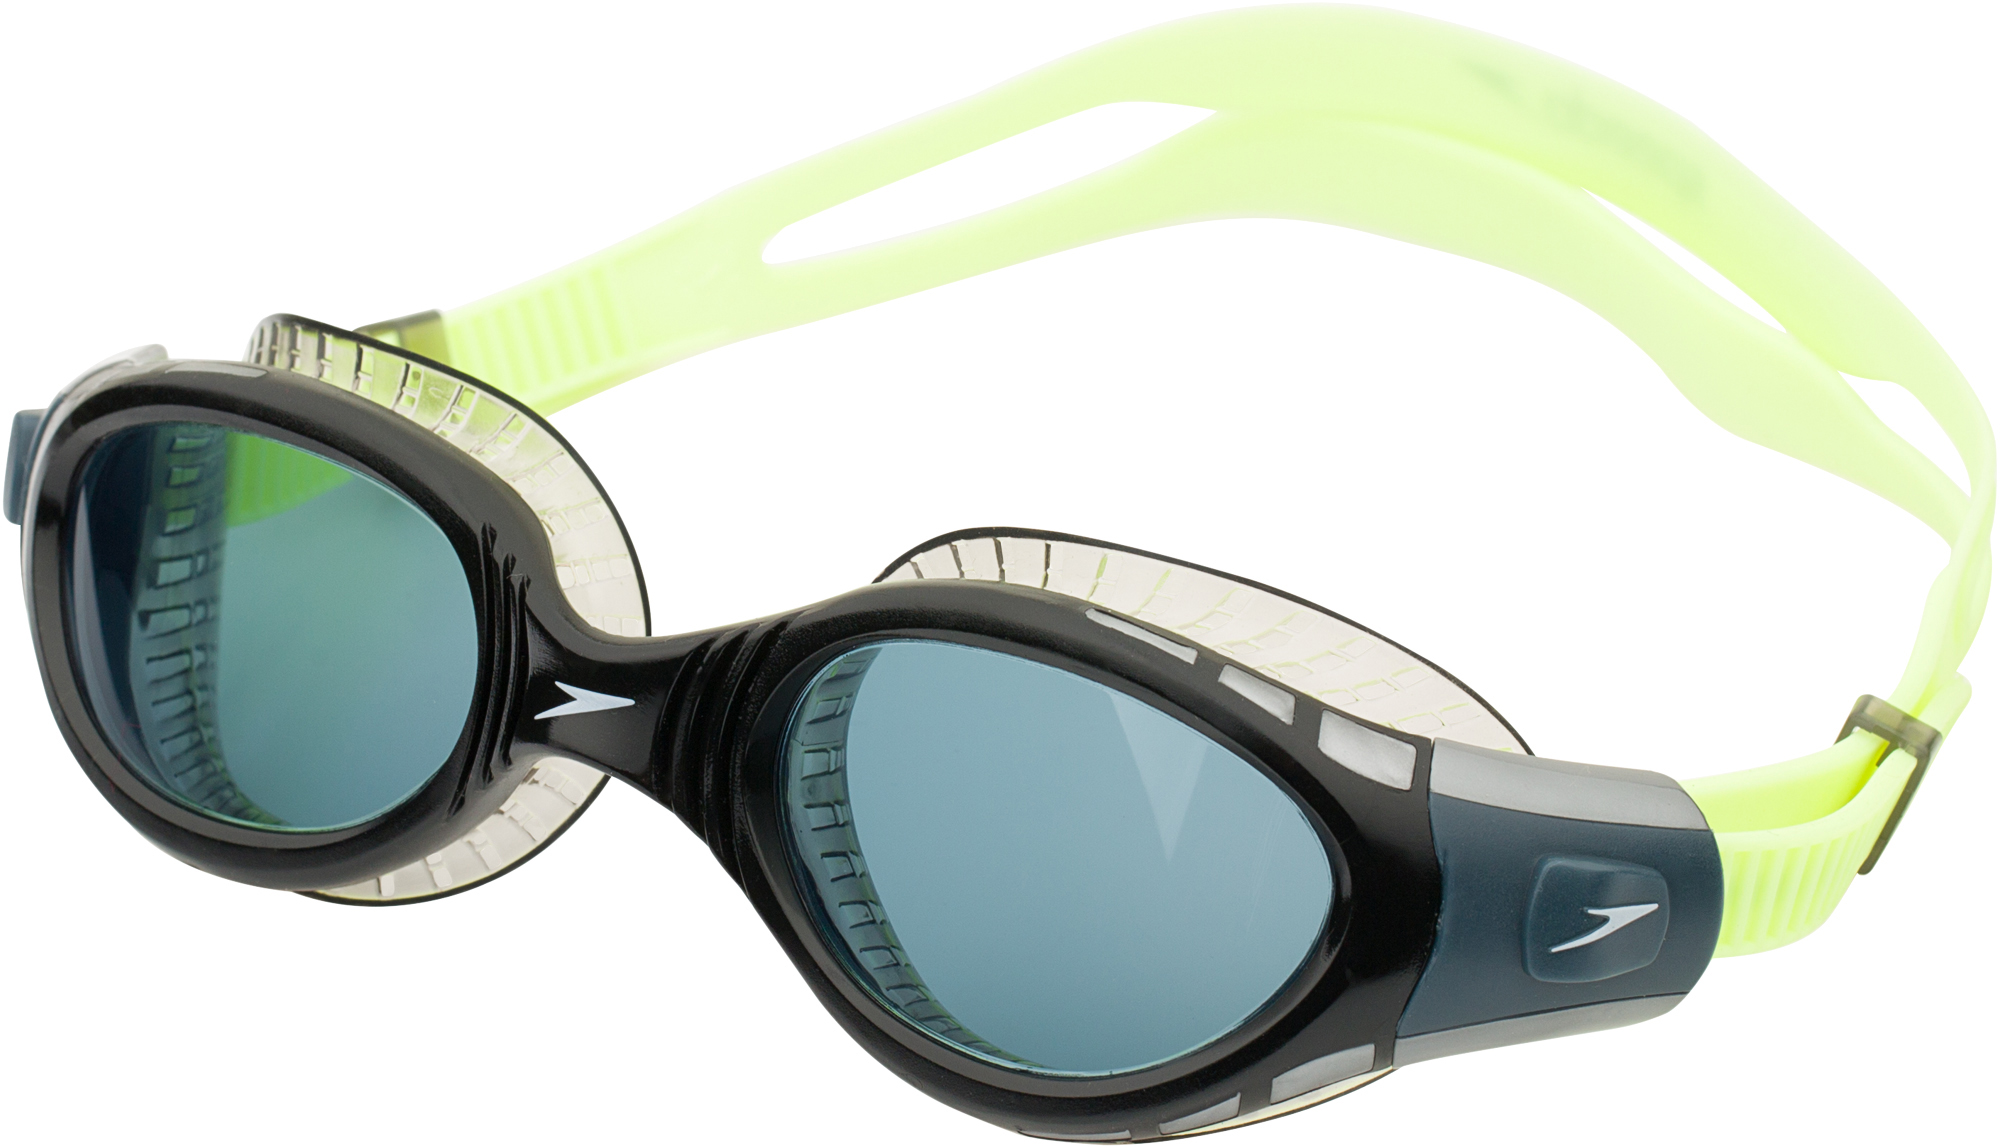 цена на Speedo Очки для плавания Speedo Futura Biofuse Flexiseal